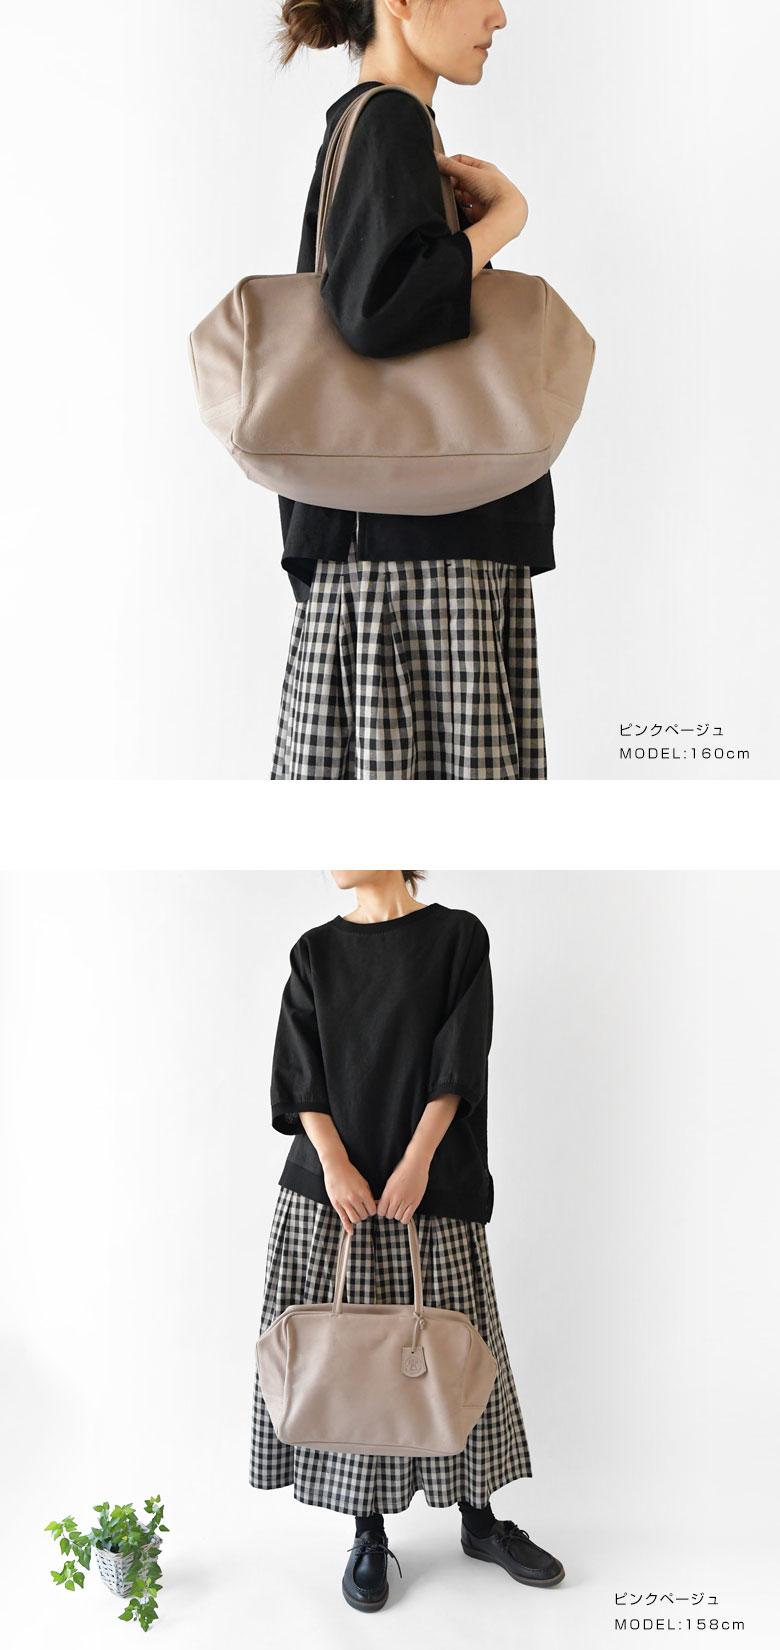 【REN レン】スクエア ダッフル トート バッグ Mサイズ (fu-30252)